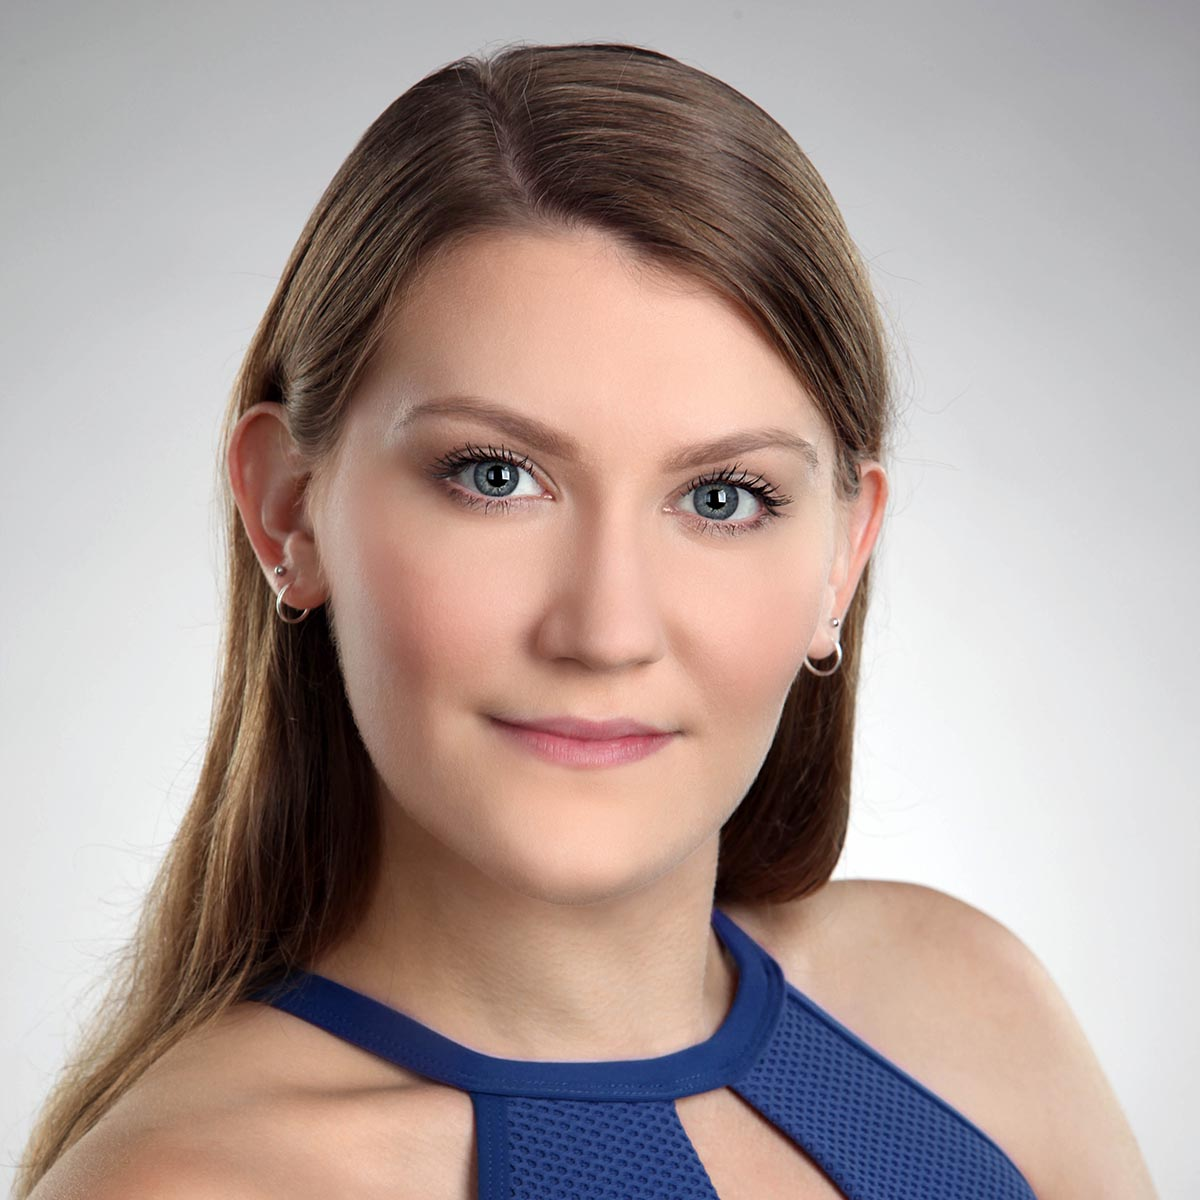 female portrait for acting